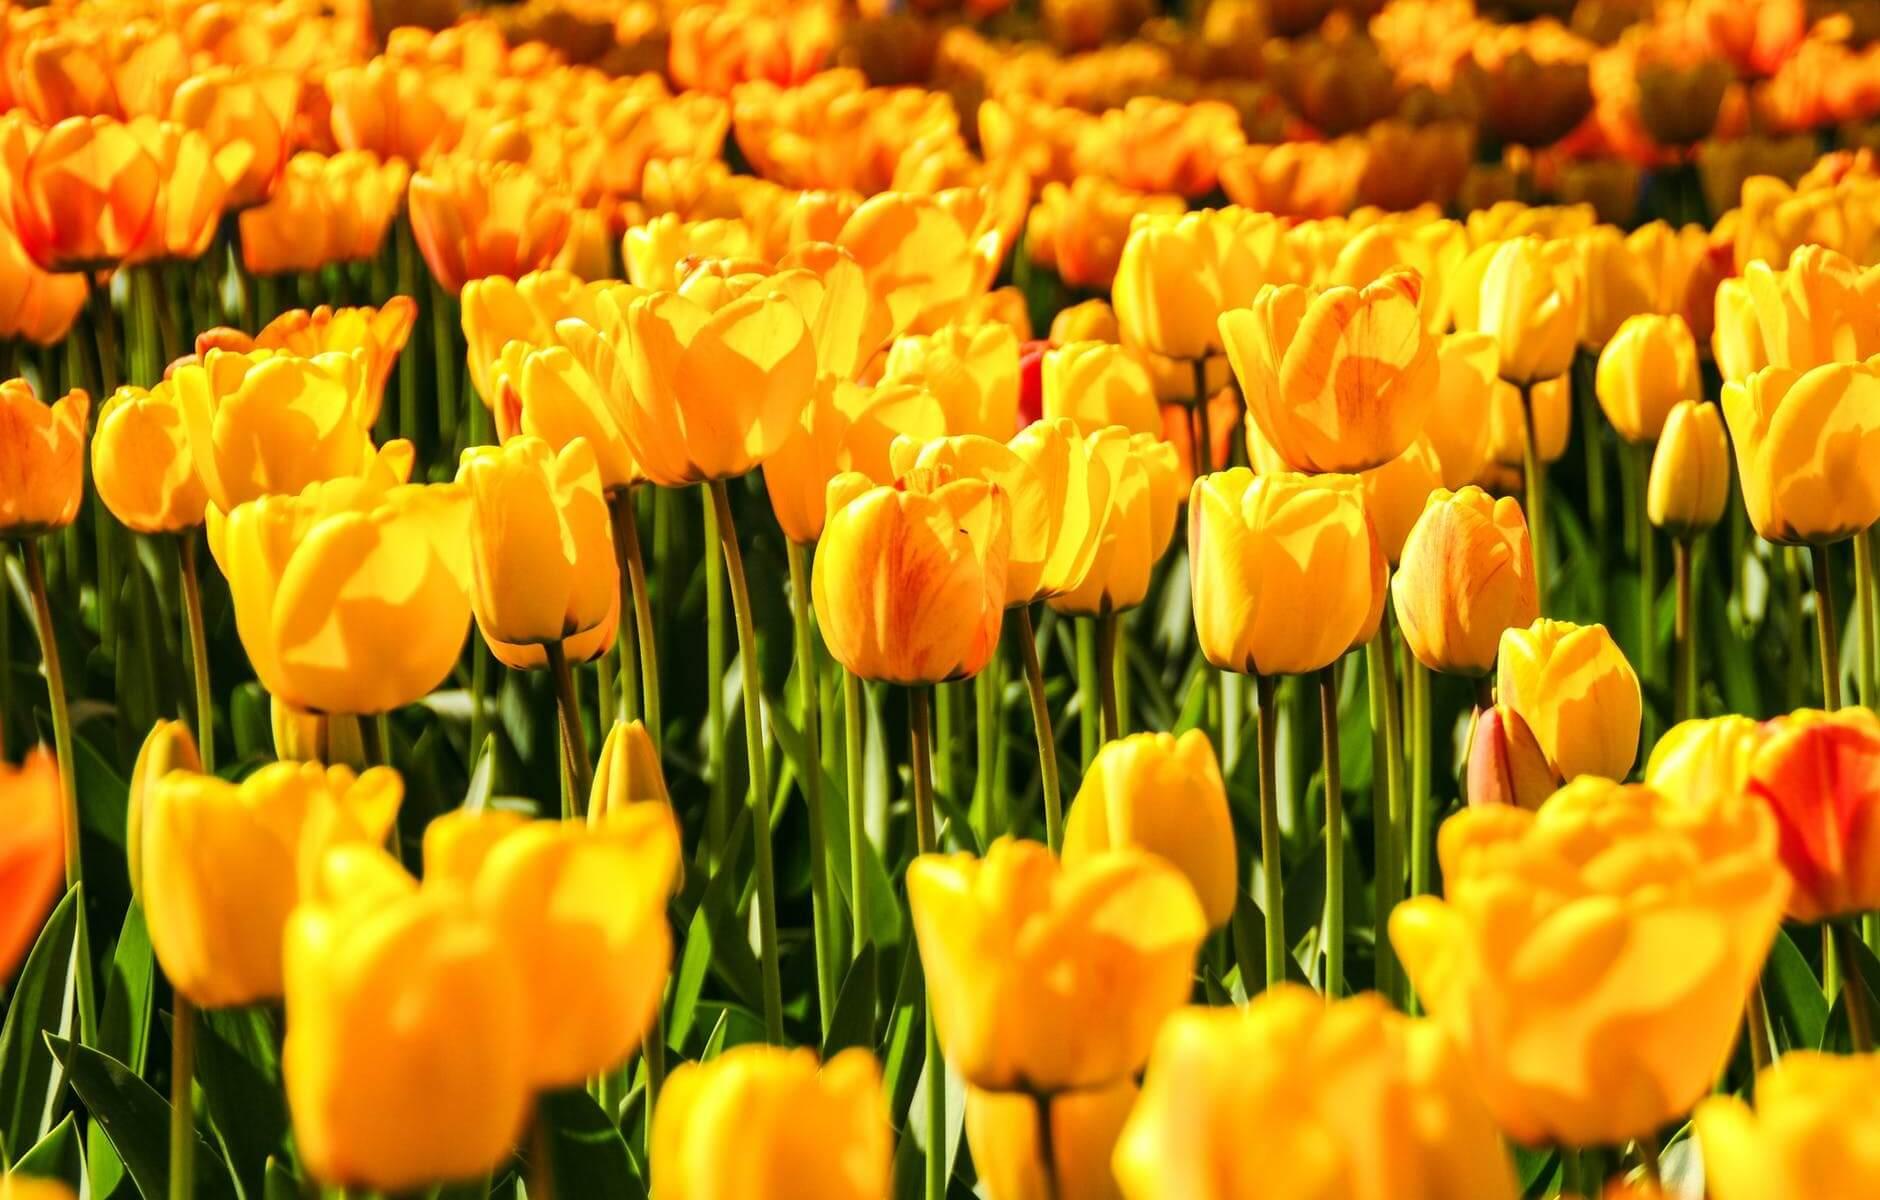 yellow tulip field landscape photography